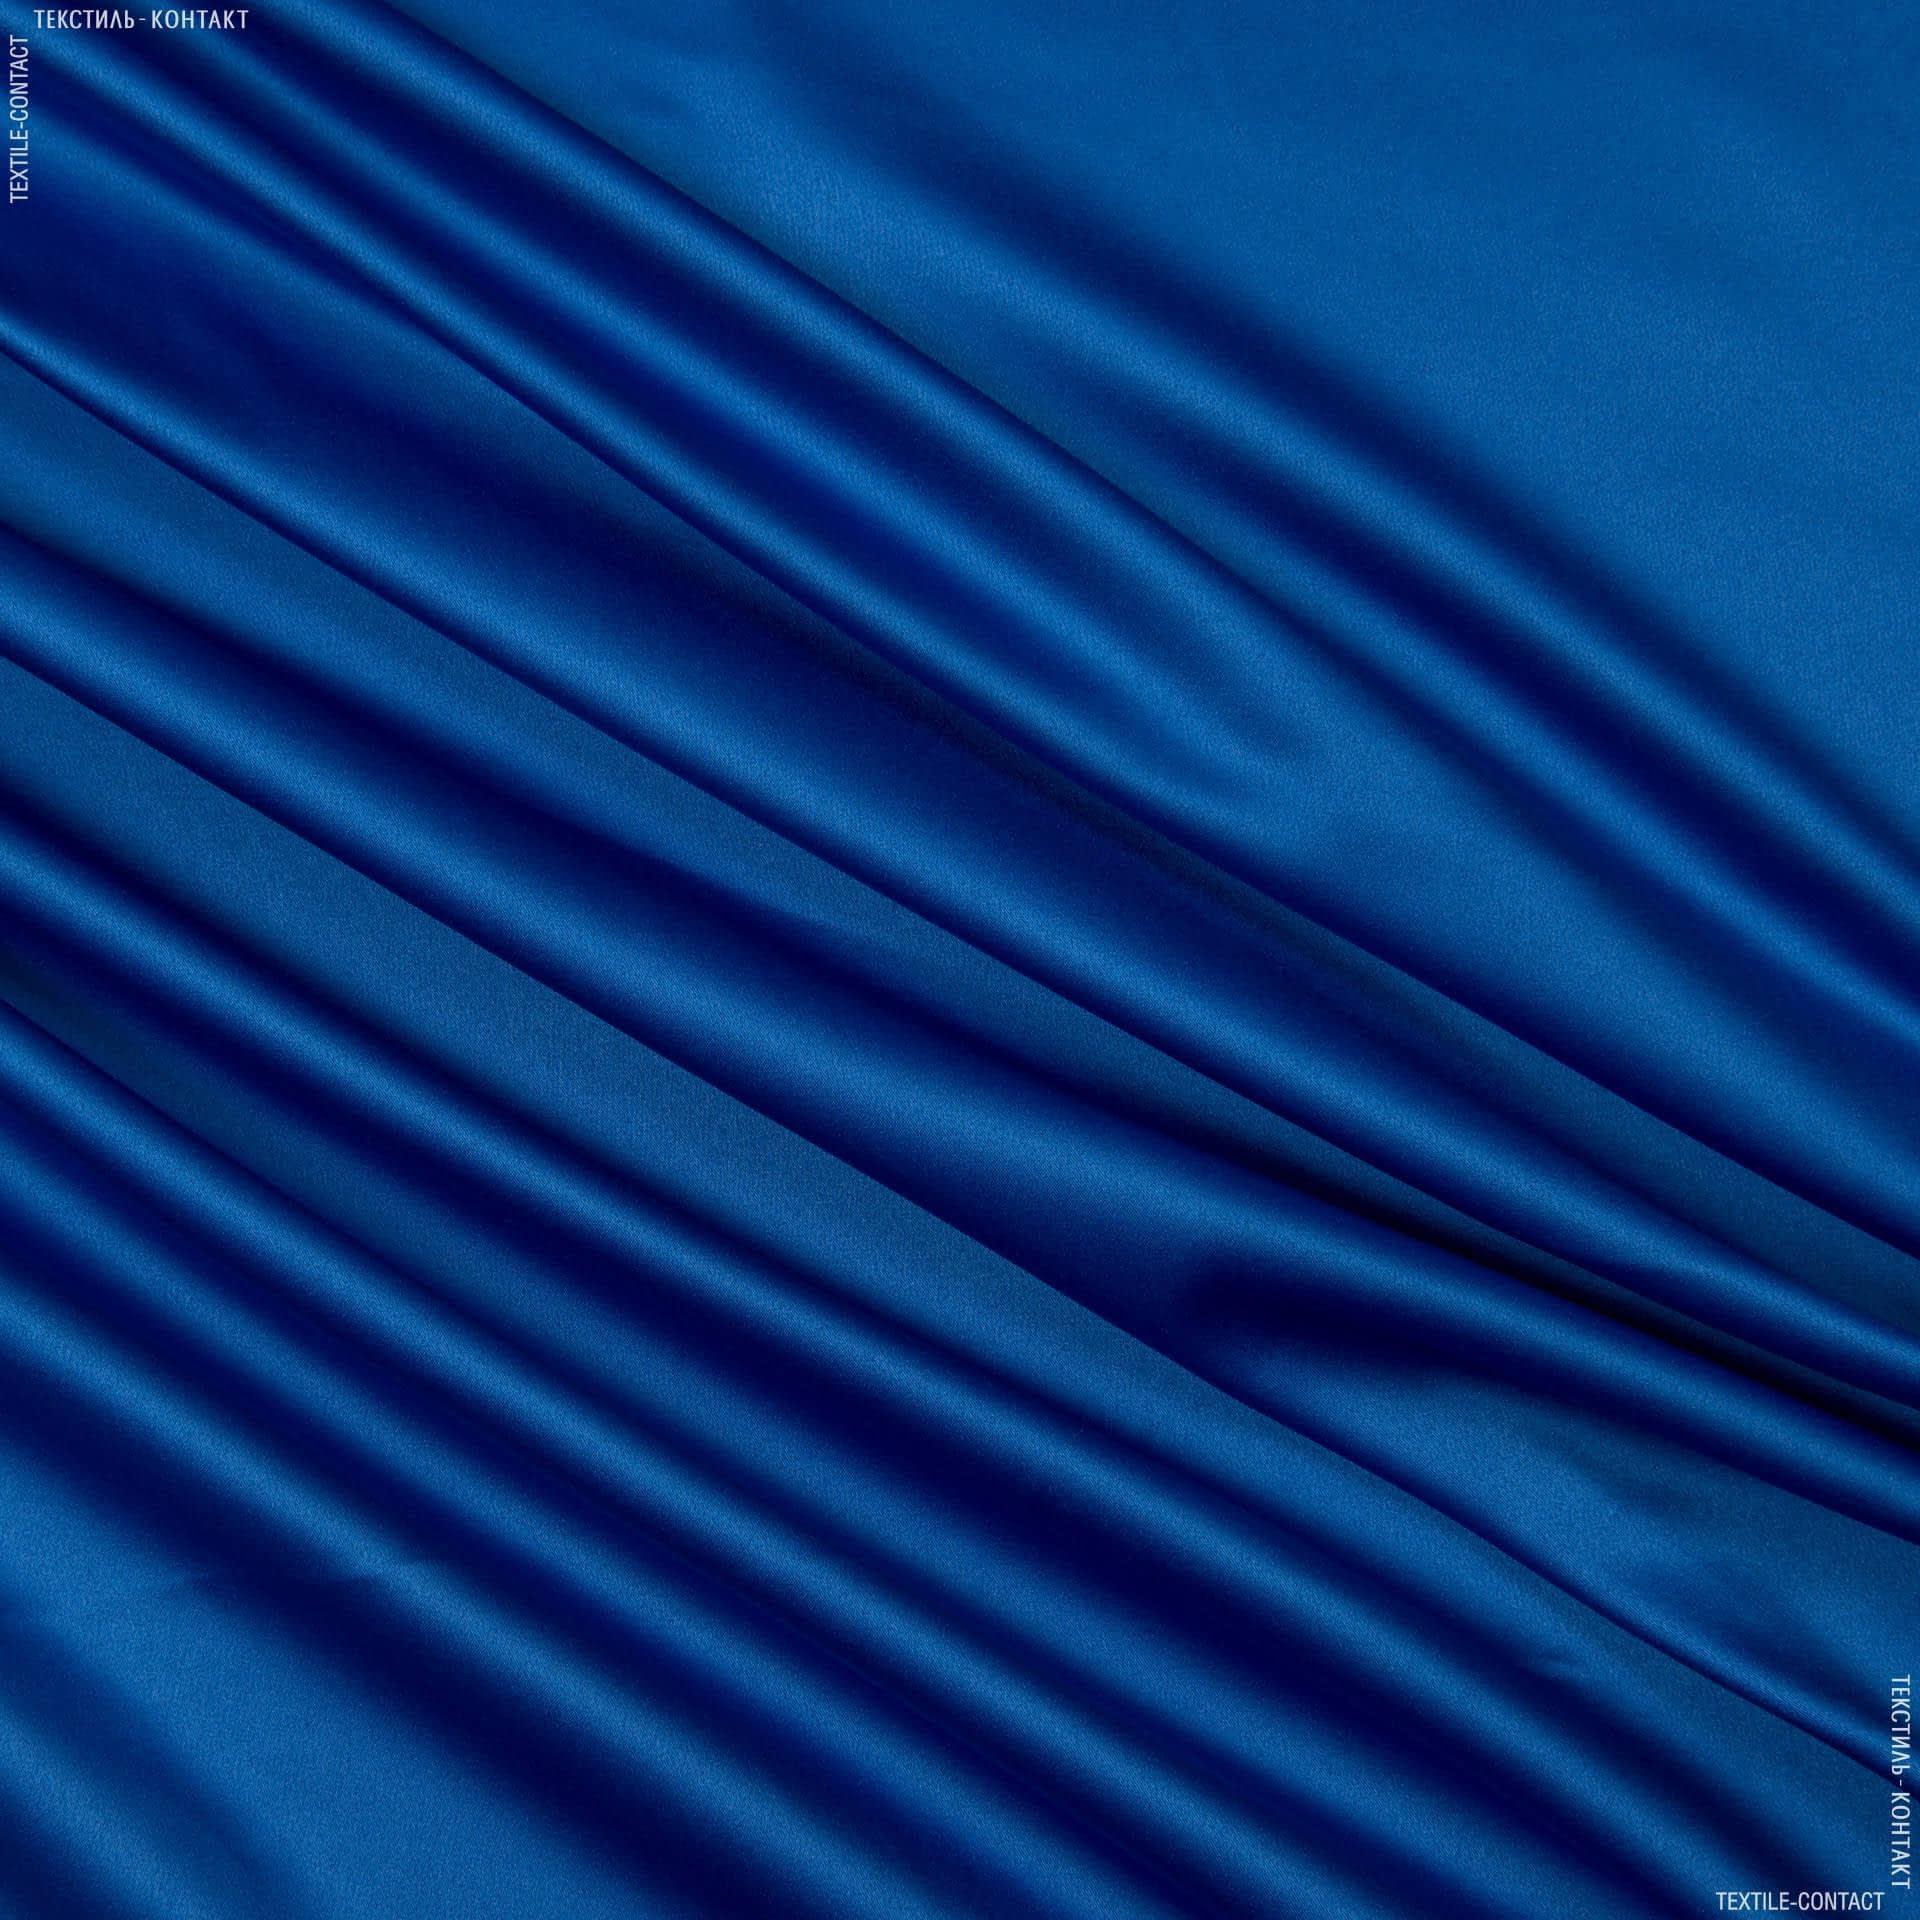 Тканини для хусток та бандан - Атлас стрейч електрик